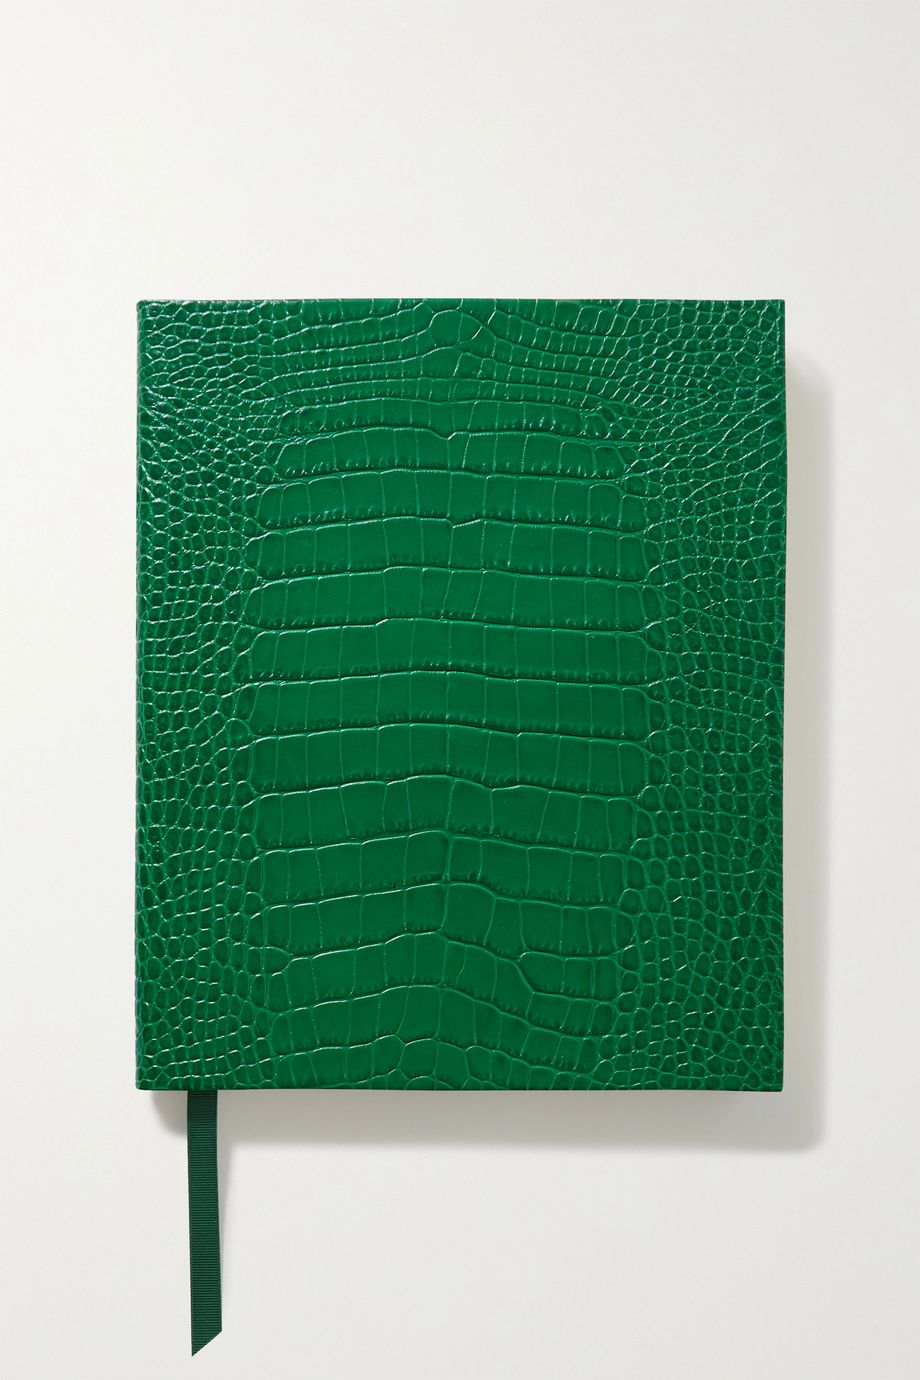 Smythson Portobello croc-effect leather notebook